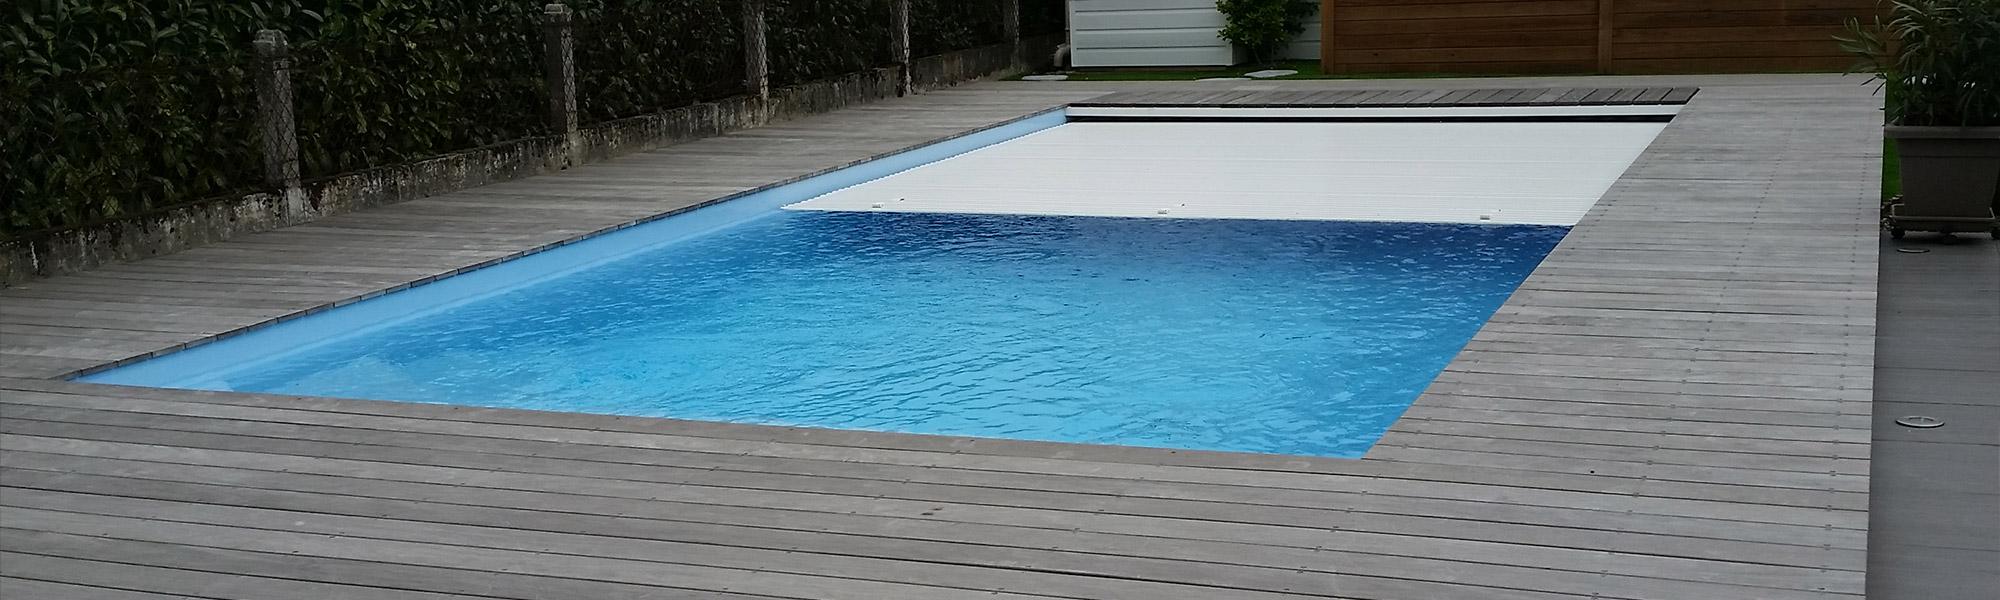 free piscine coque bordeaux with piscine pessac horaires. Black Bedroom Furniture Sets. Home Design Ideas